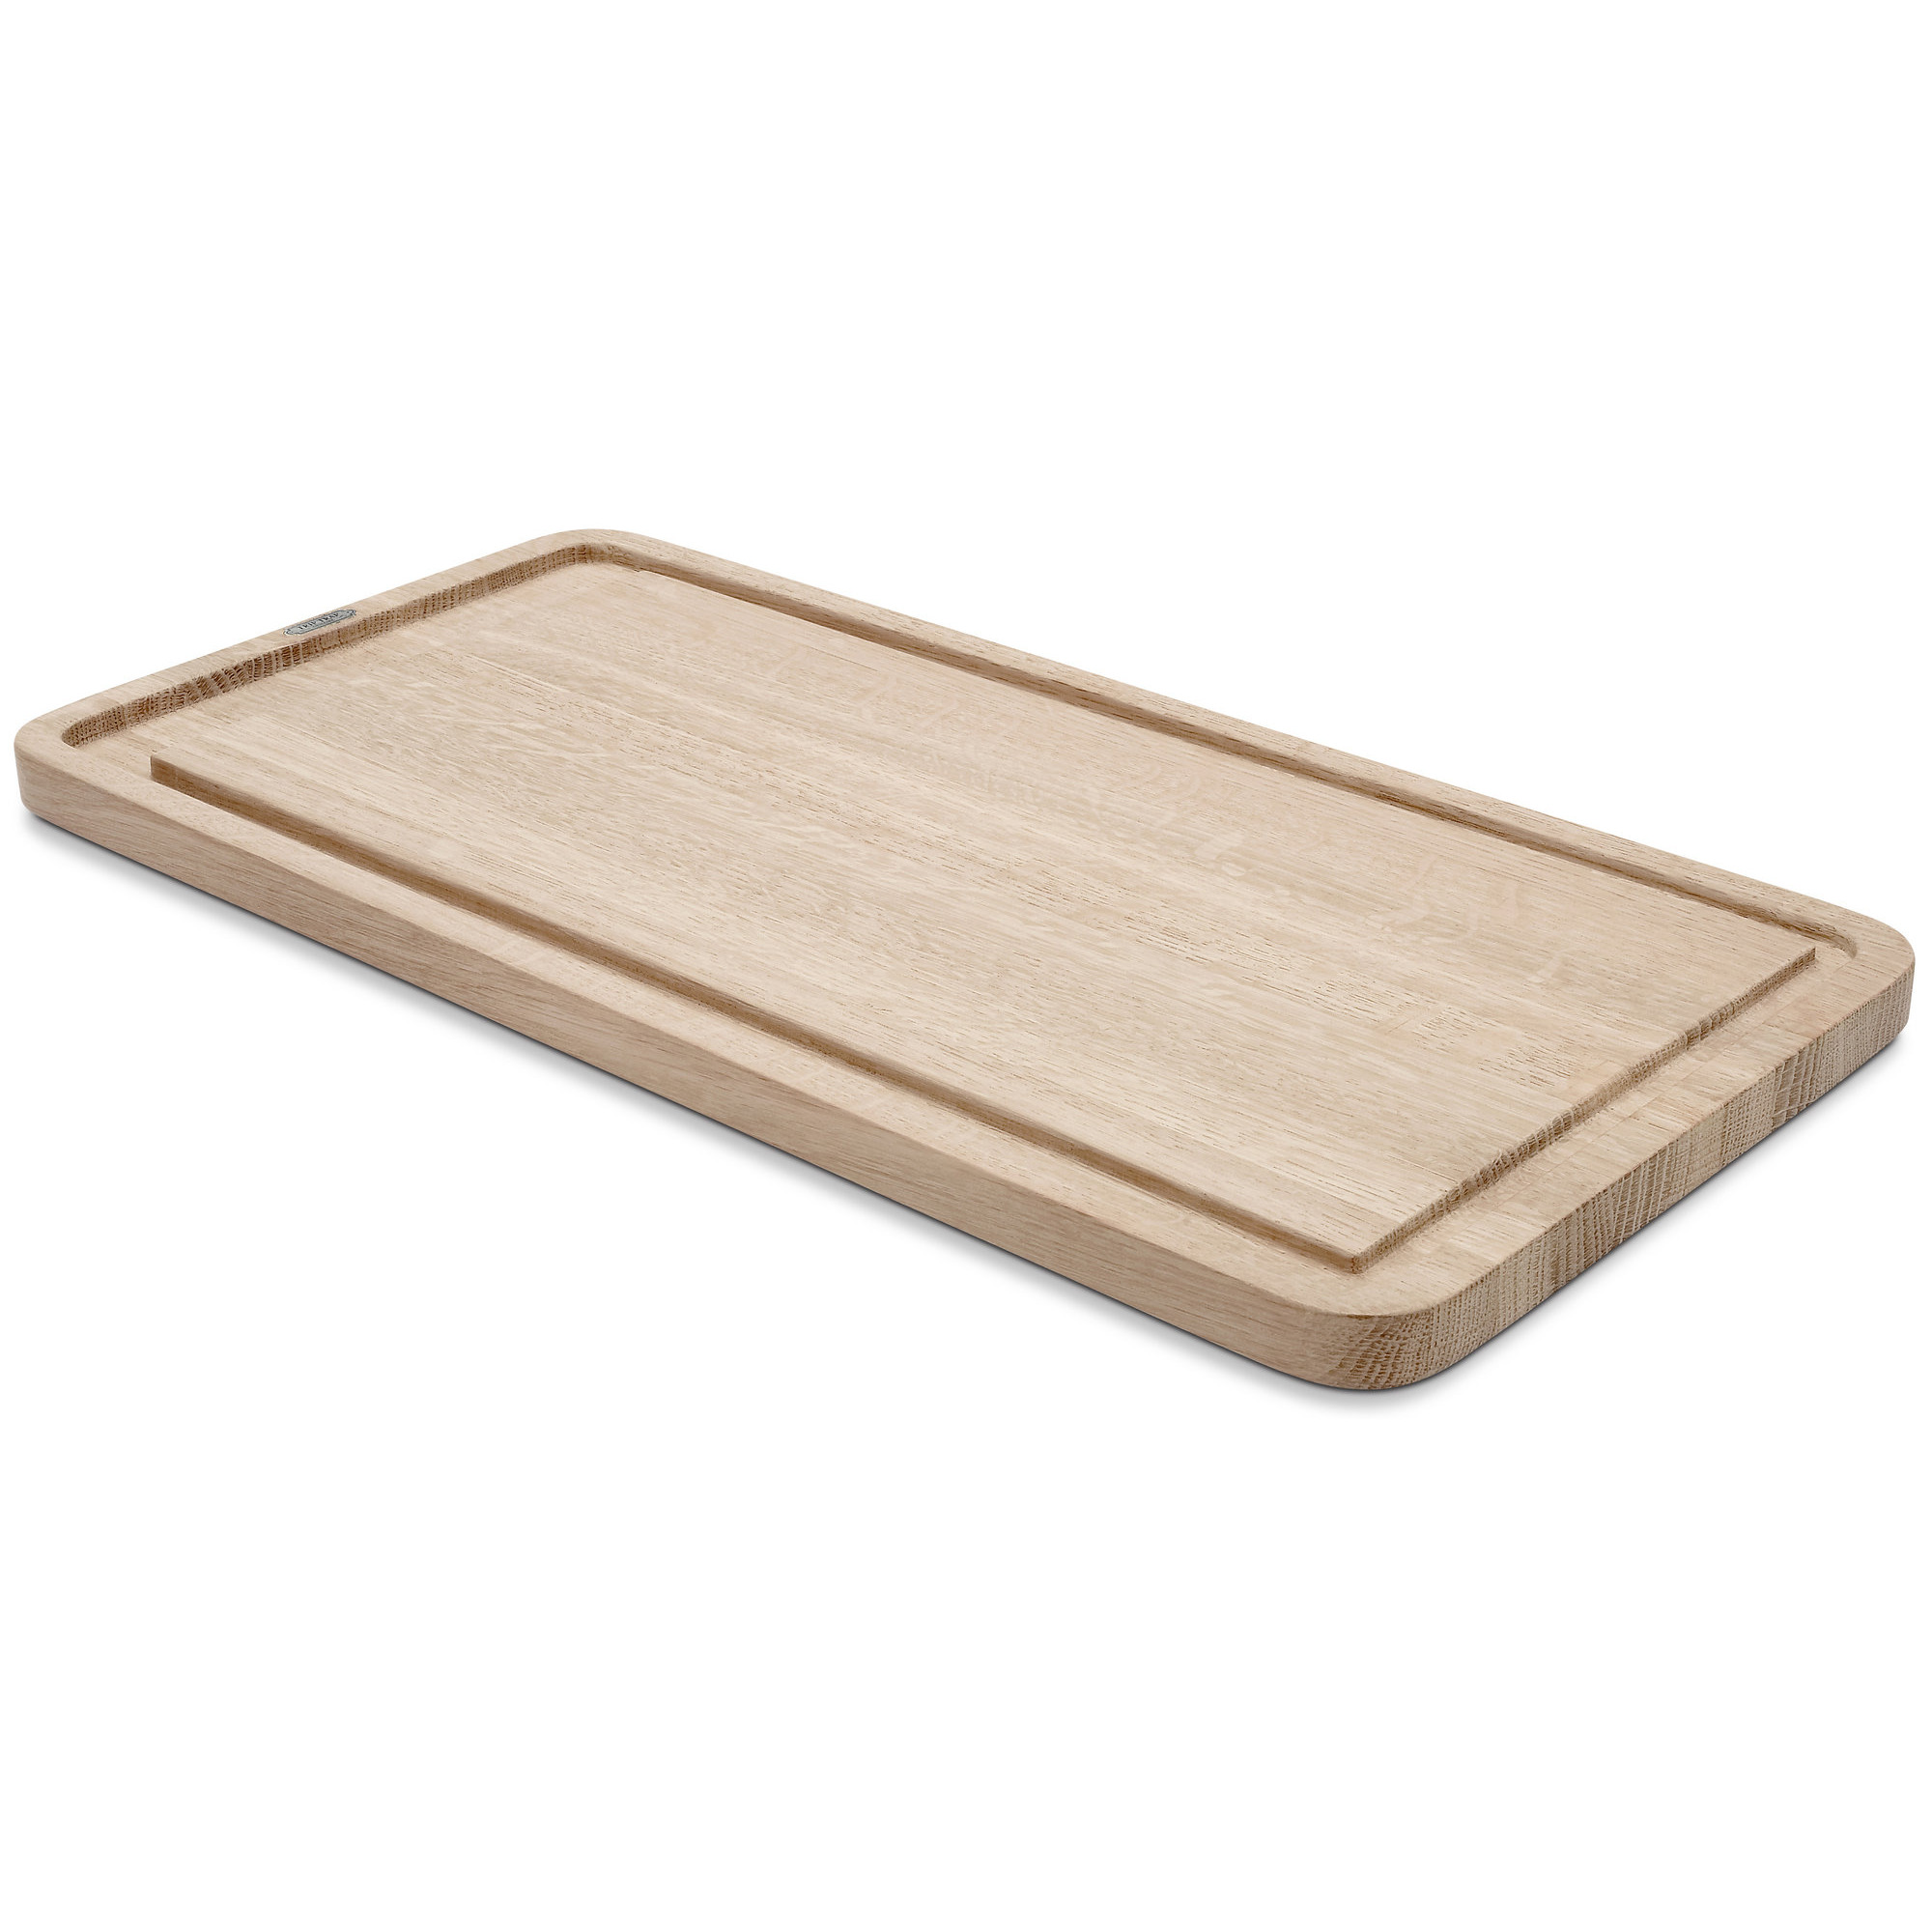 Skagerak Plank Planksteksskärbräda 50x25 cm